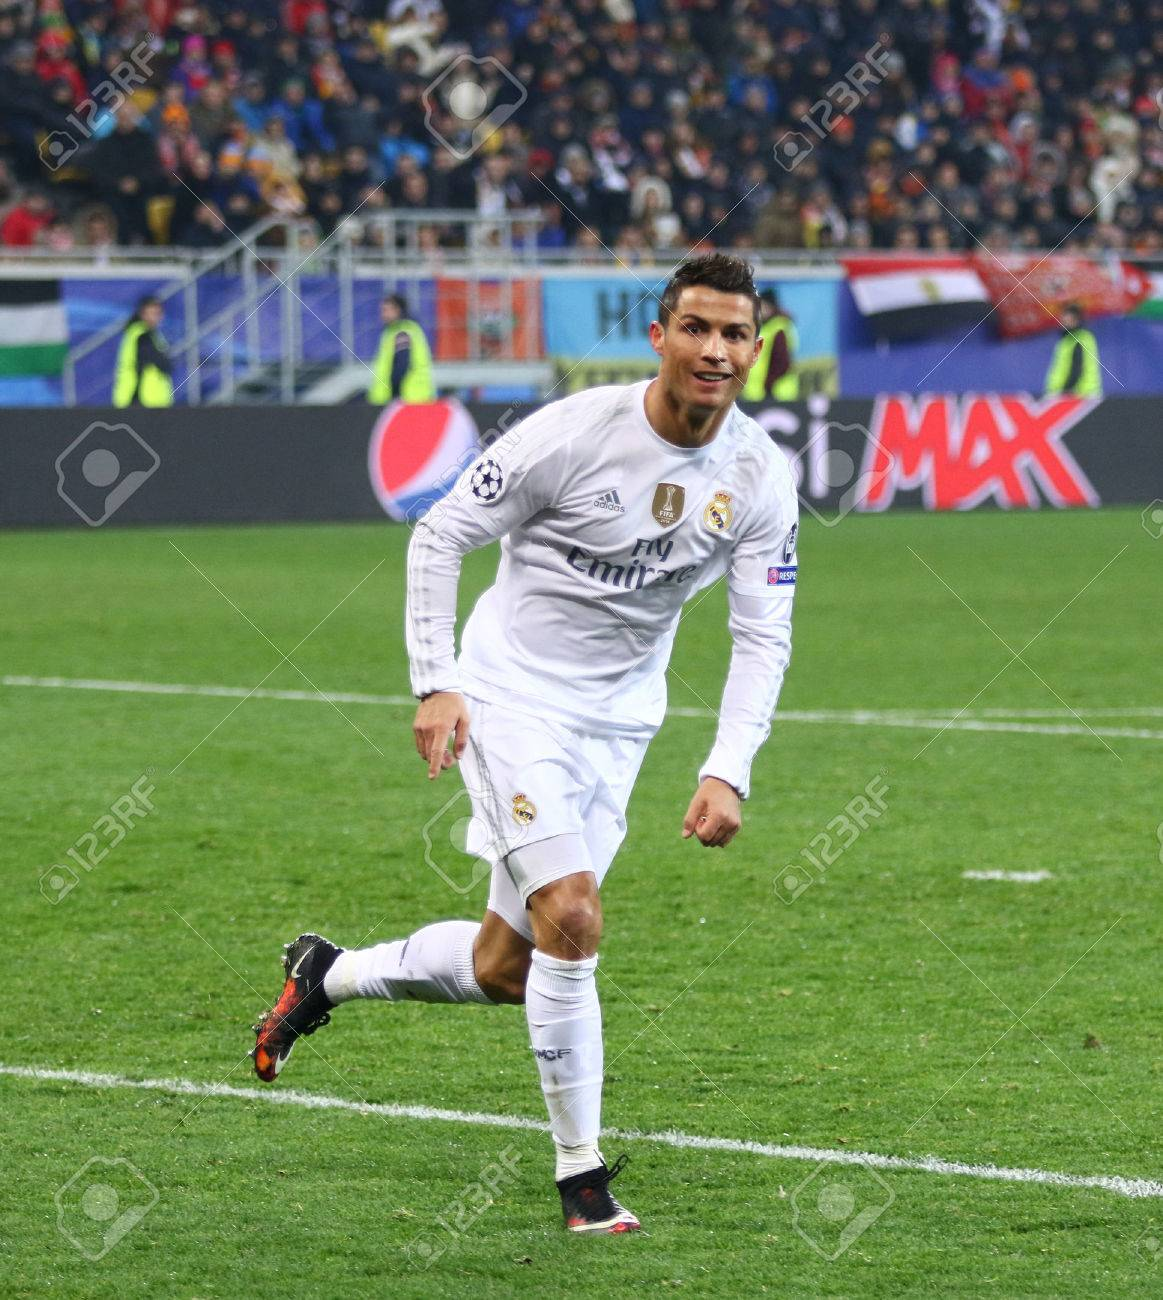 Lviv Ukraine November 25 2015 Cristiano Ronaldo Of Real Stock Photo Picture And Royalty Free Image Image 51490401